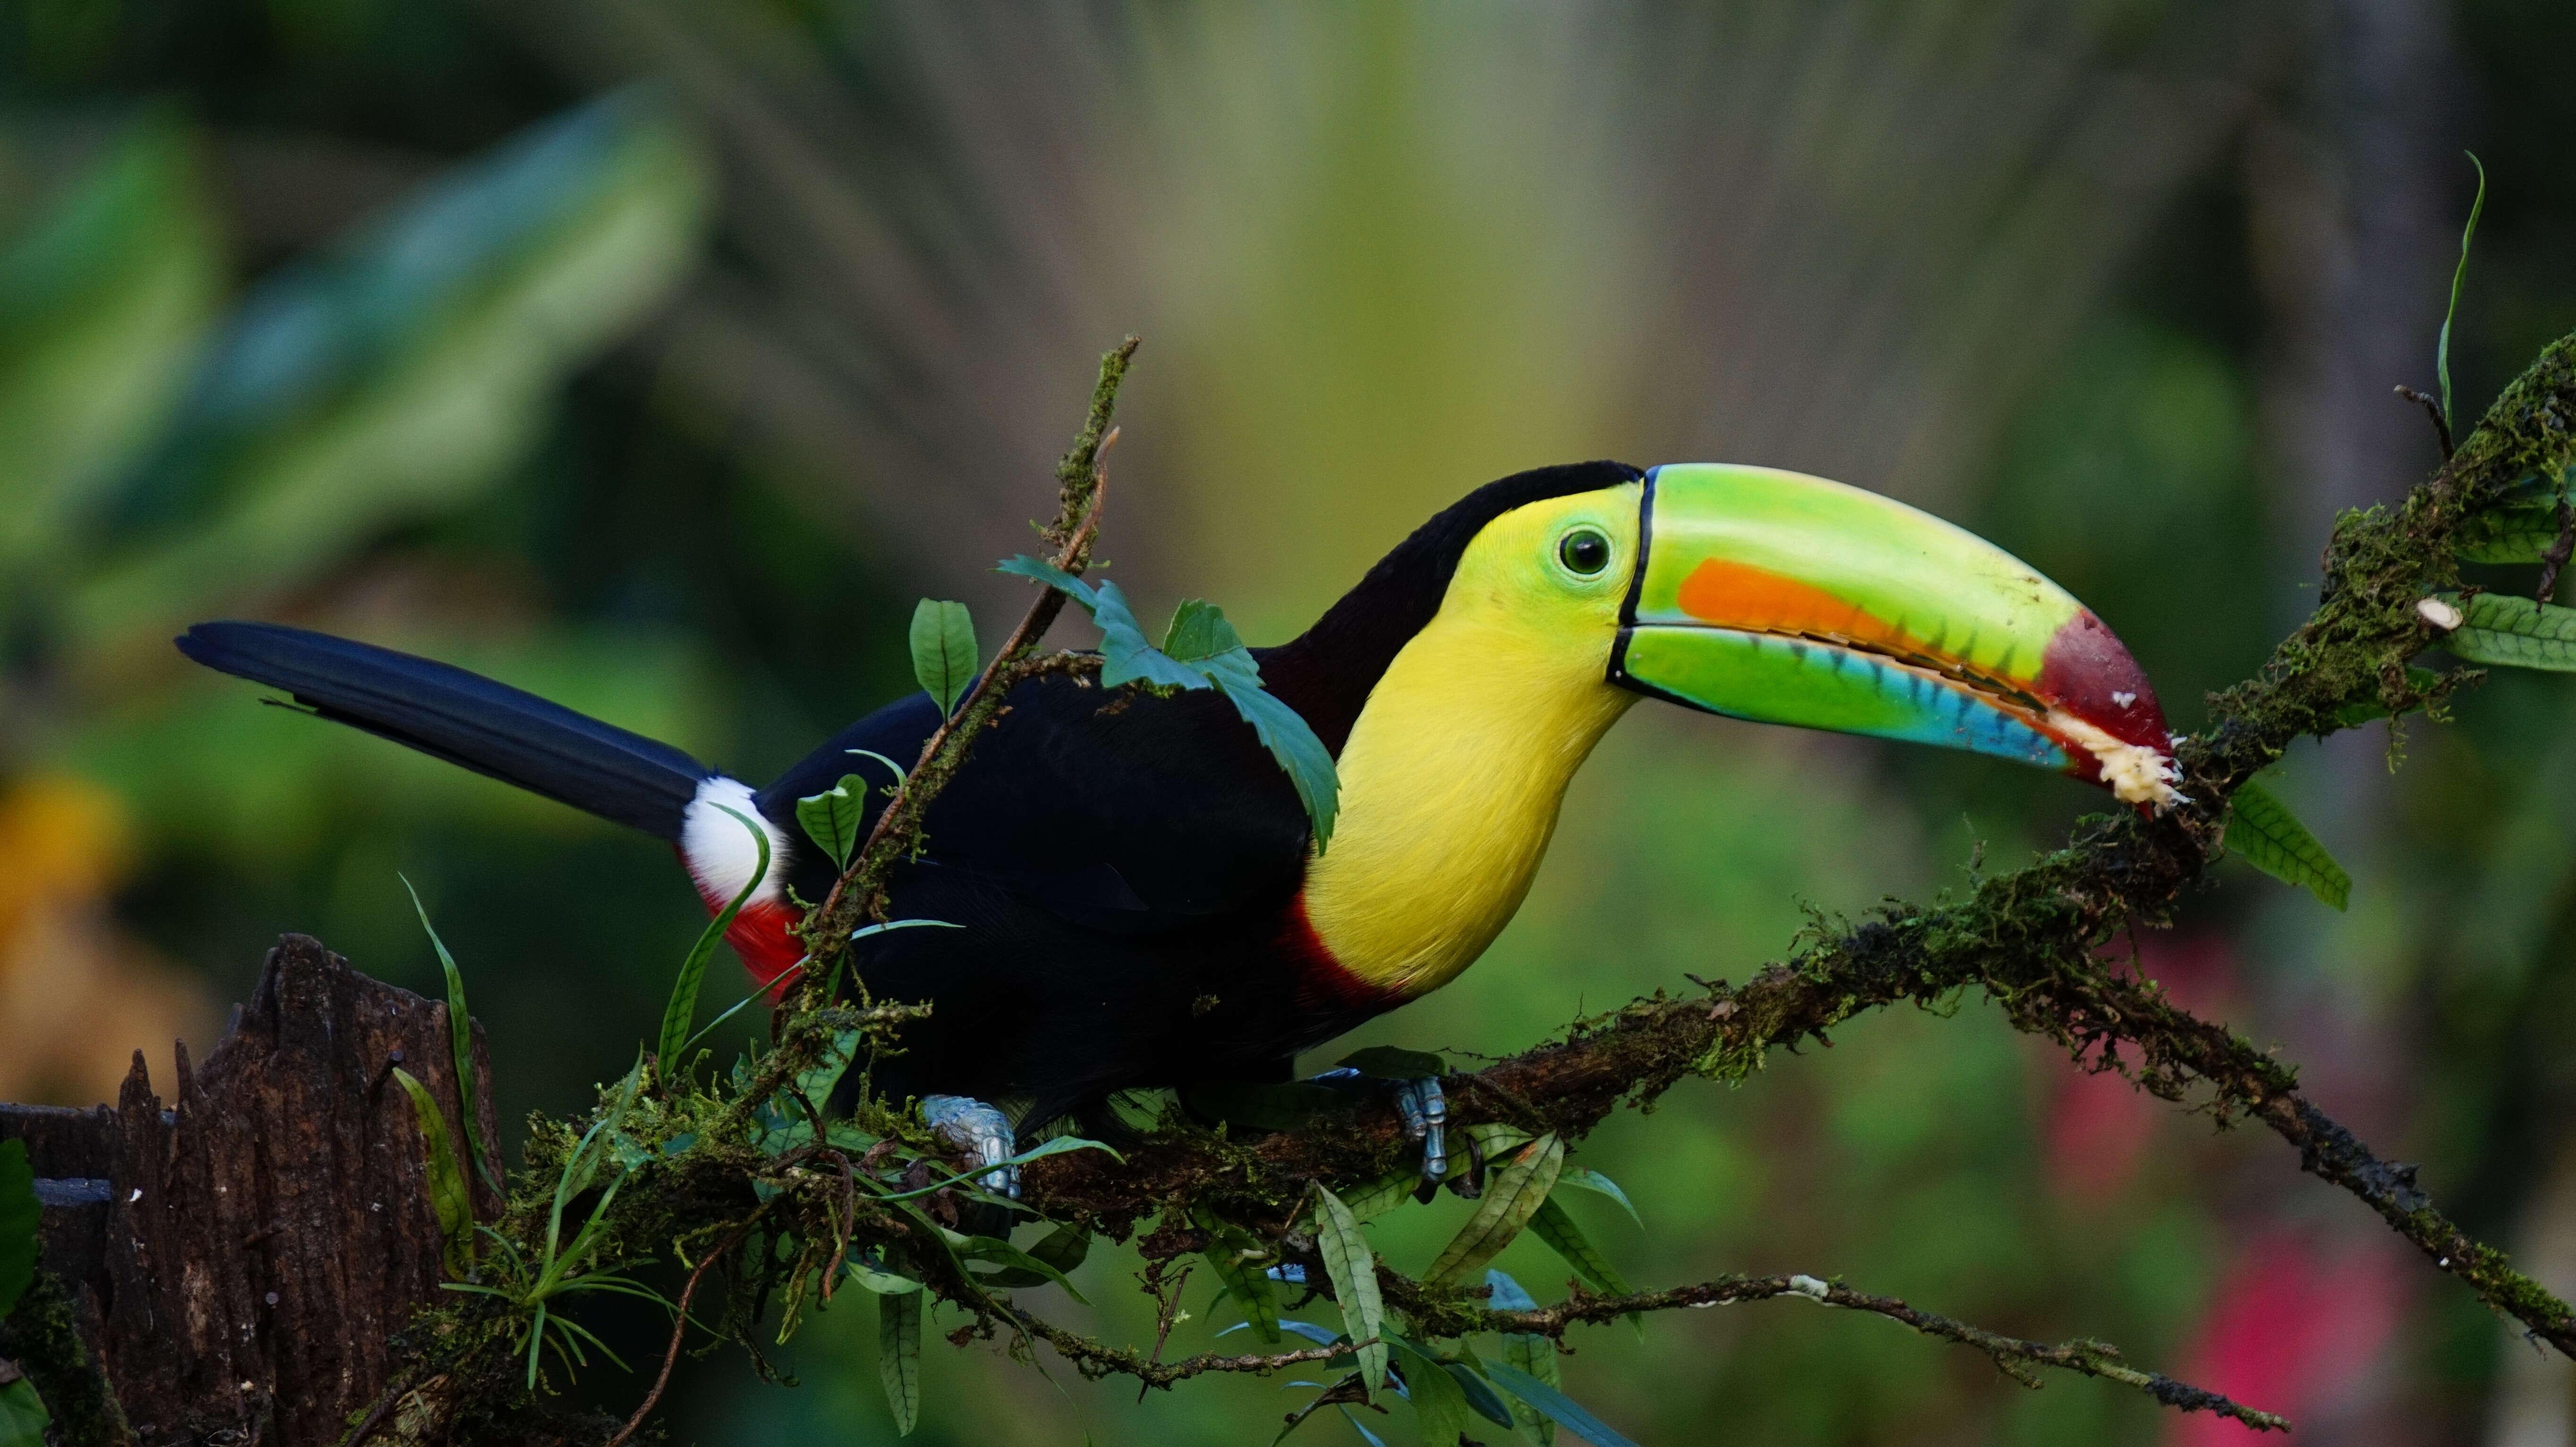 Monograms' Wanderlist Costa Rica 2019 Packages Now on Sale